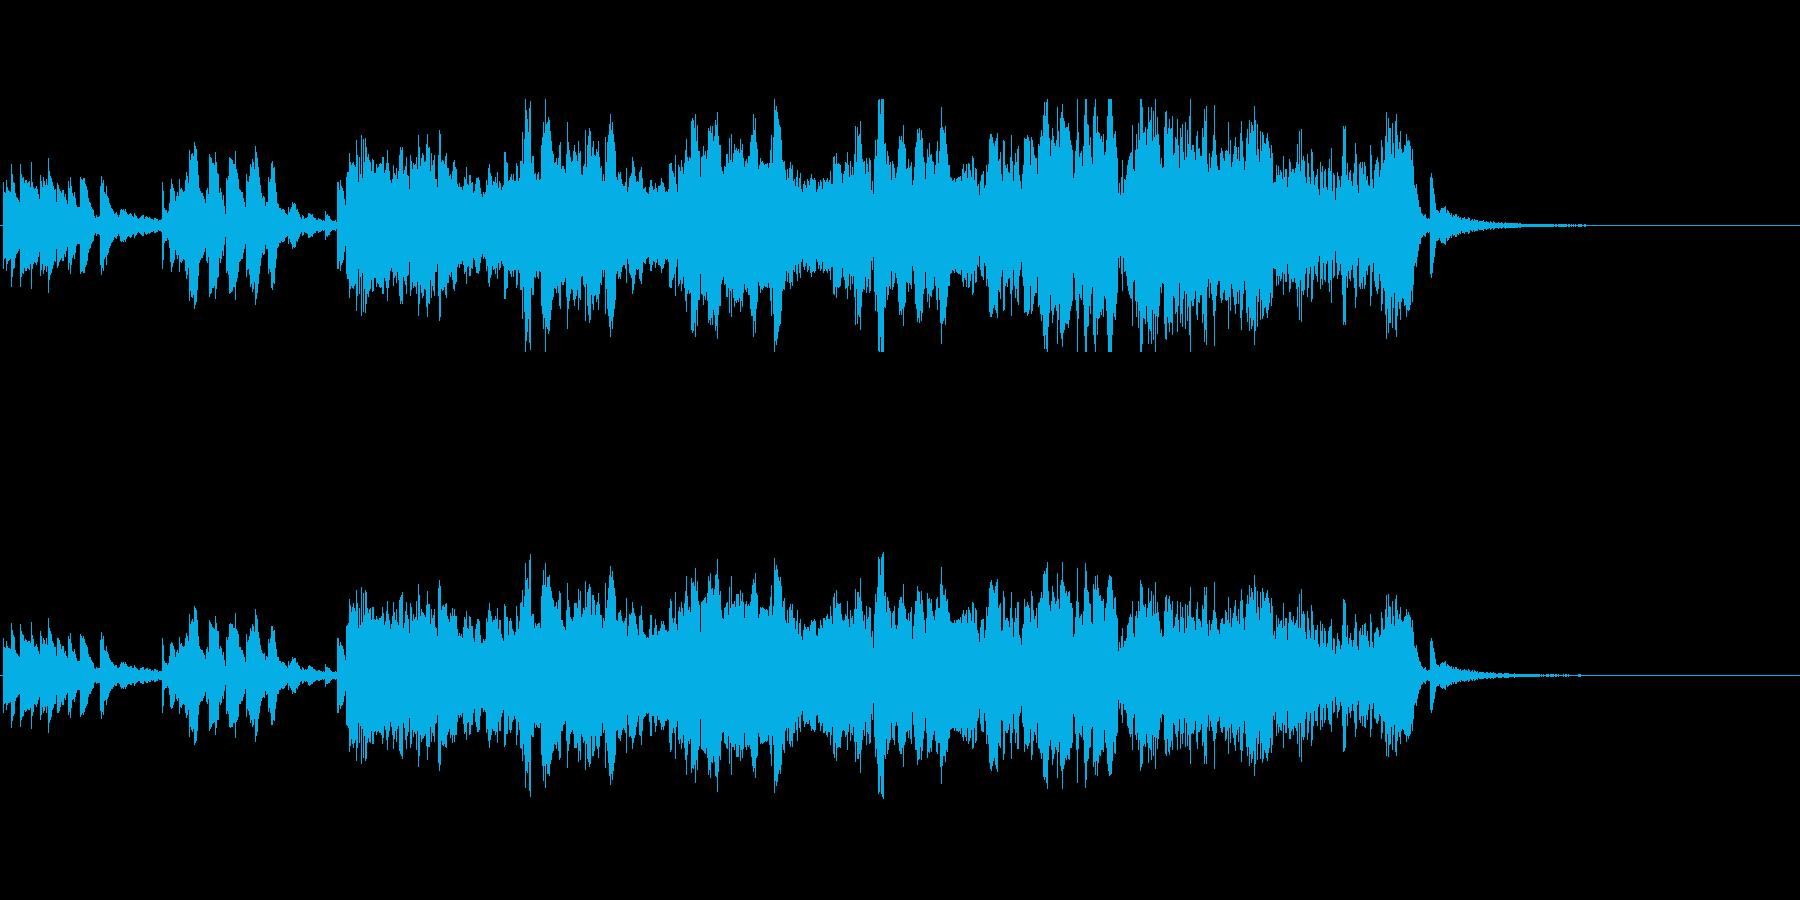 Entranceの再生済みの波形